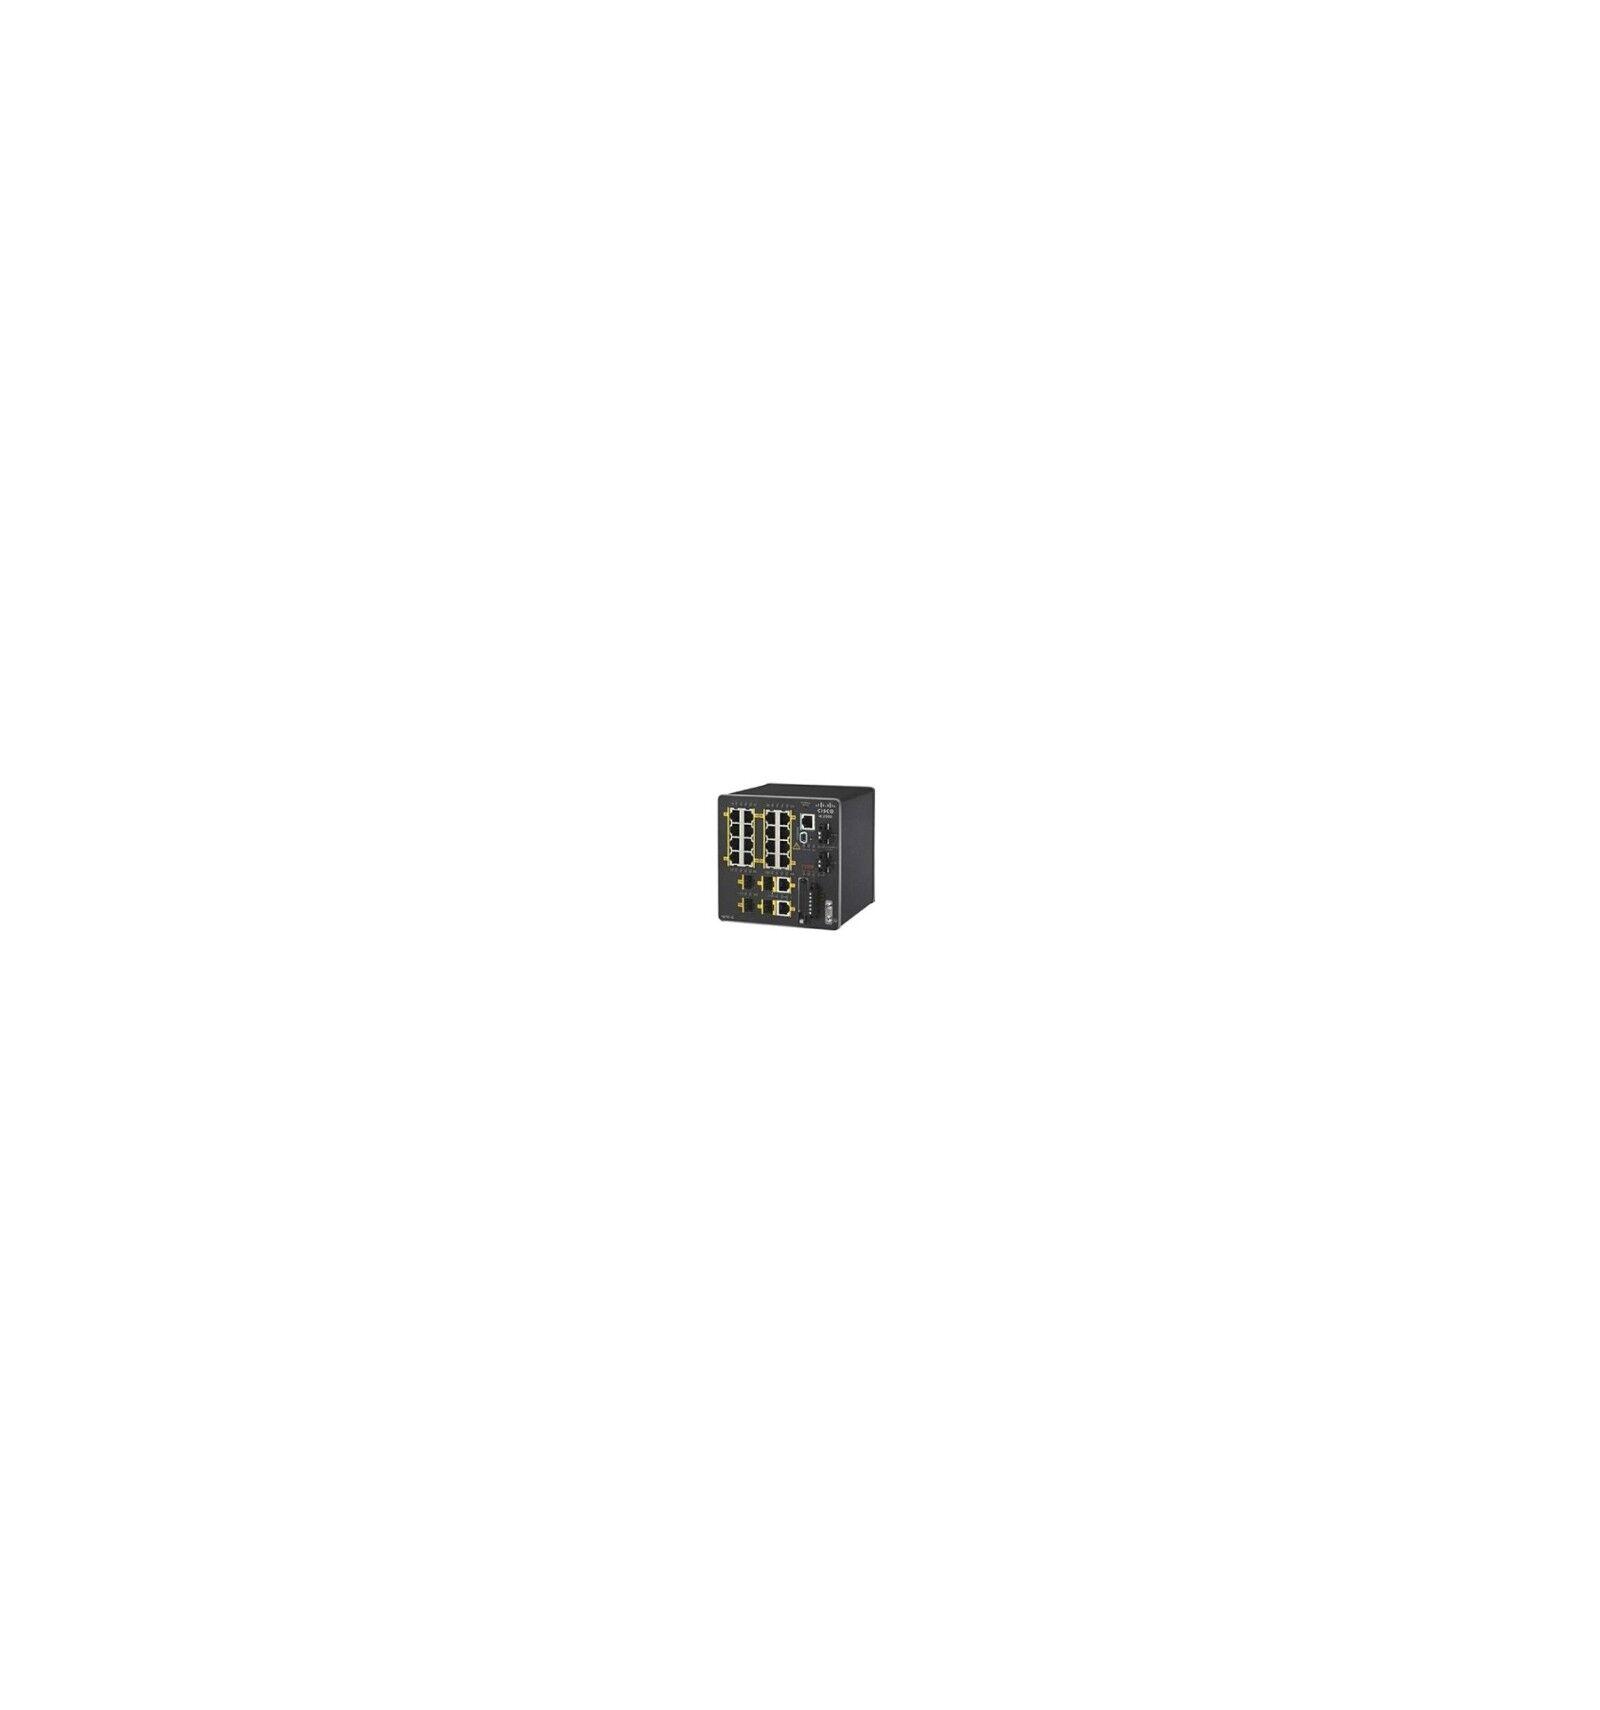 Cisco Systems IE-2000-16TC-G-L Managed network switch L2+ Fast Ethernet (10/100) Musta verkkokytkin